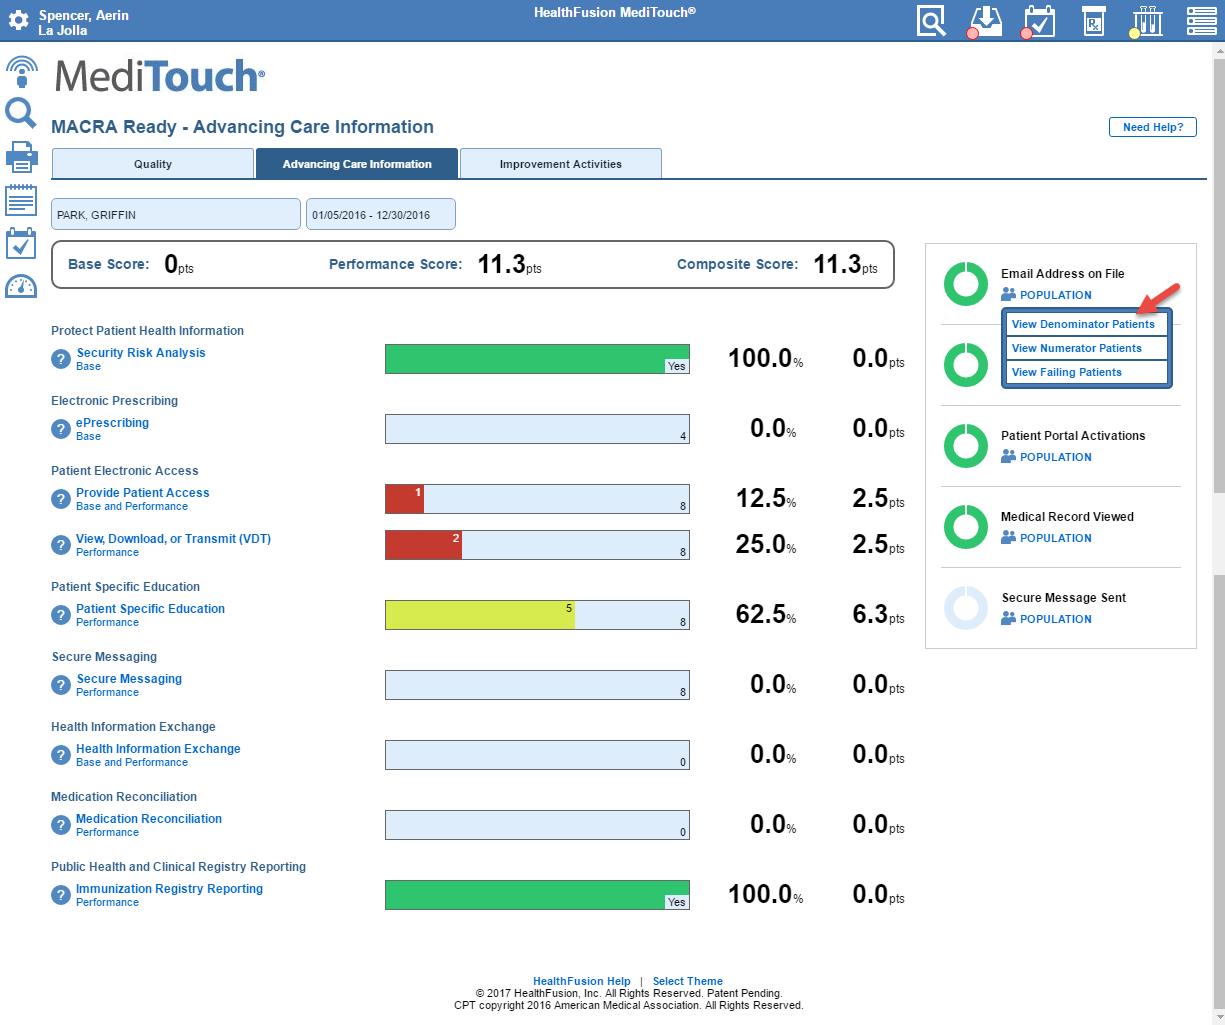 MACRA Advancing Care Scorecard Image